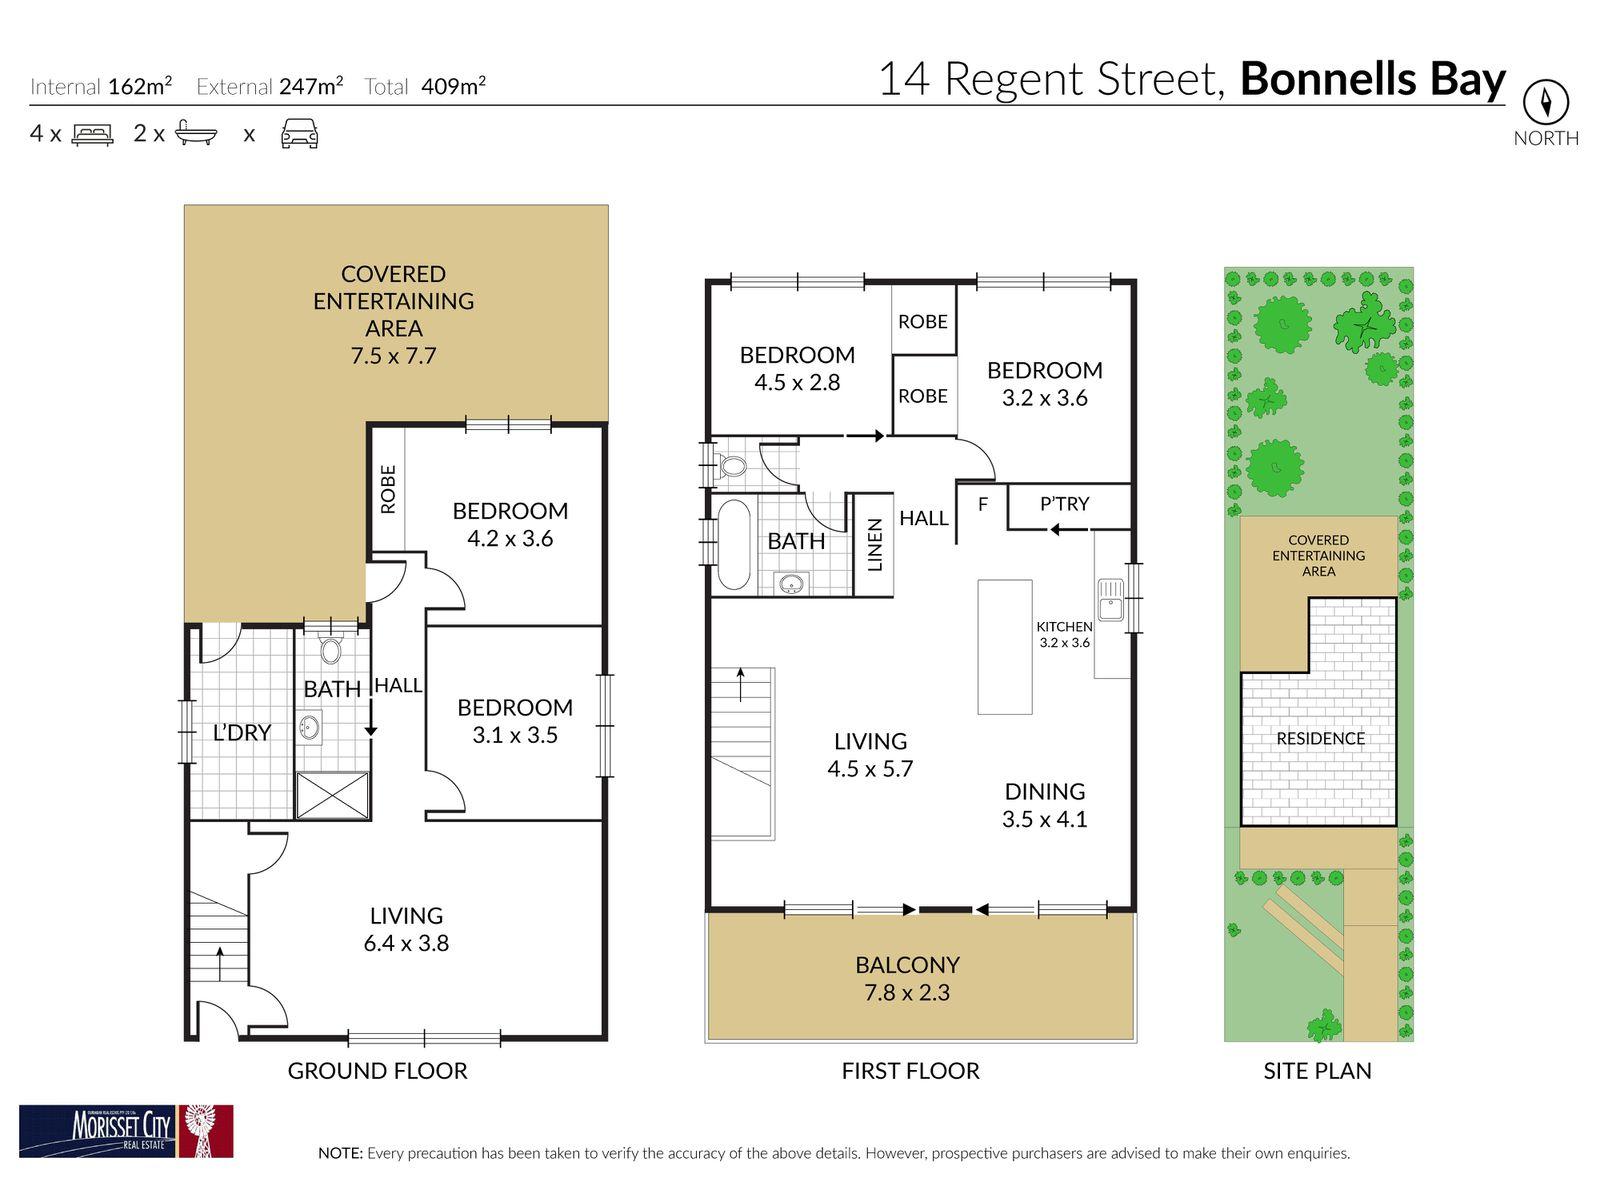 14 Regent Street, Bonnells Bay